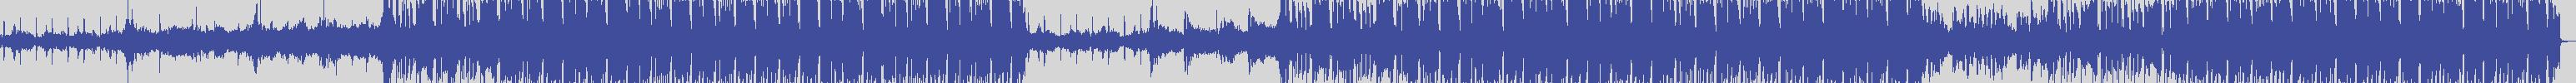 worldwide_music_records [WMR002] Save As - Marechiaro [Original Mix] audio wave form